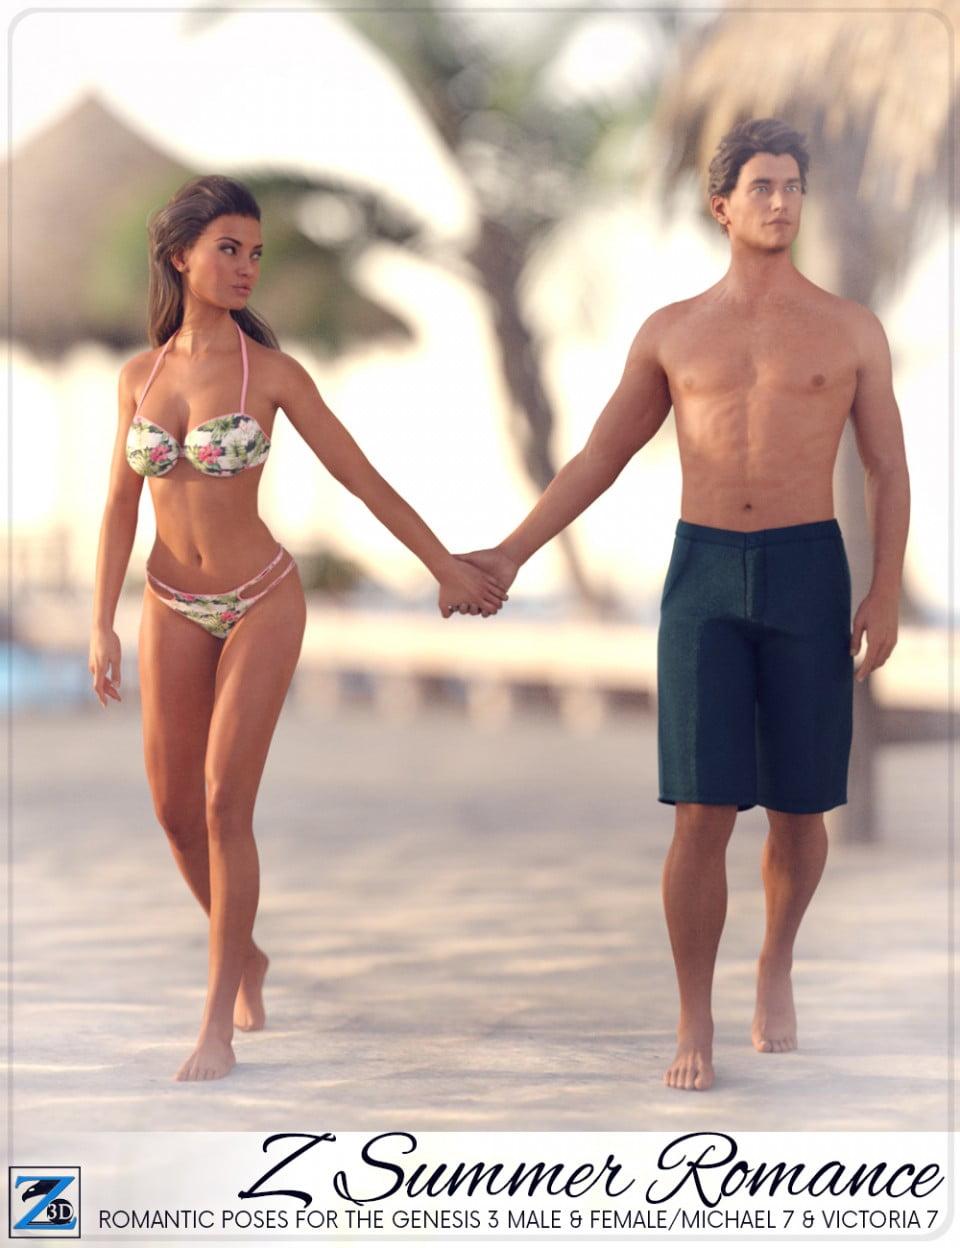 Z Summer Romance – Poses for Genesis 3 Male & FemaleMichael 7 & Victoria 7